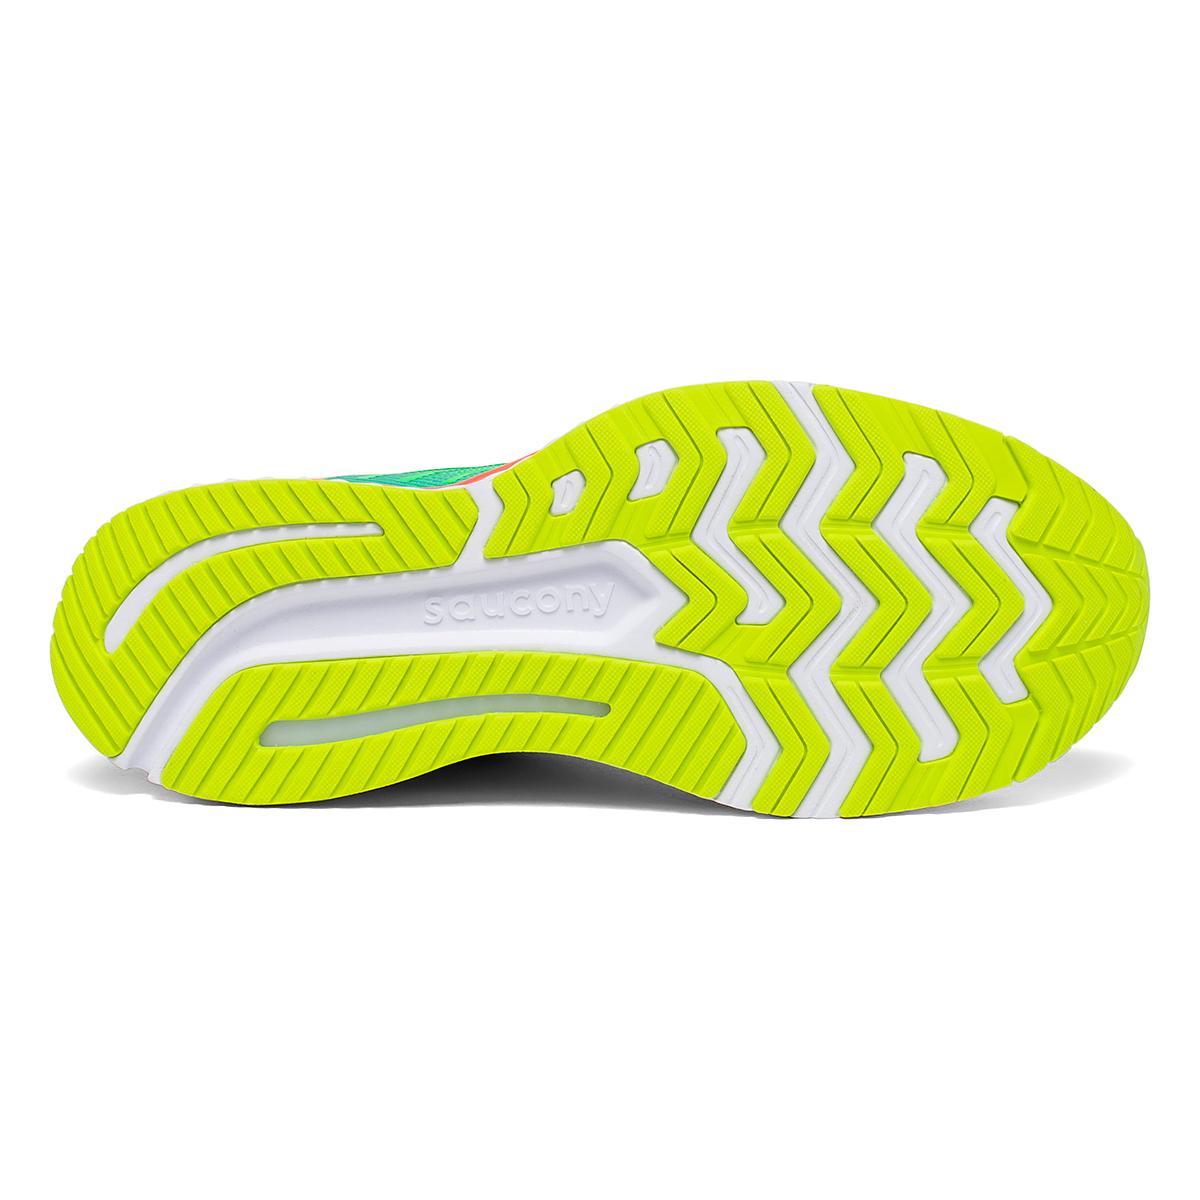 Men's Saucony Guide 13 Running Shoe - Color: Green Mutant - Size: 7 - Width: Regular, Green Mutant, large, image 4